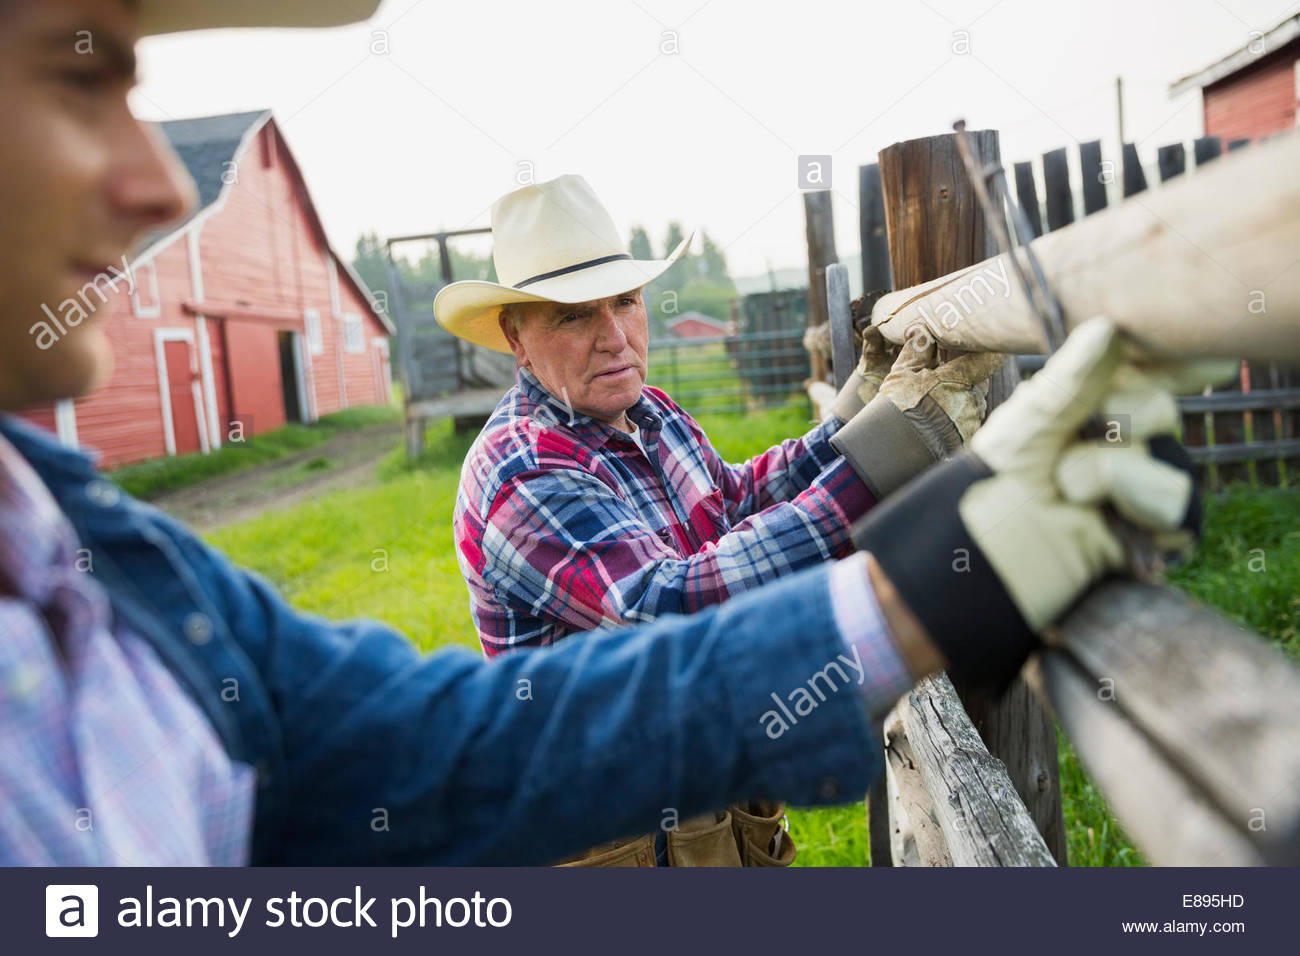 Rancher Zaunpfosten in Weide zu ersetzen Stockbild